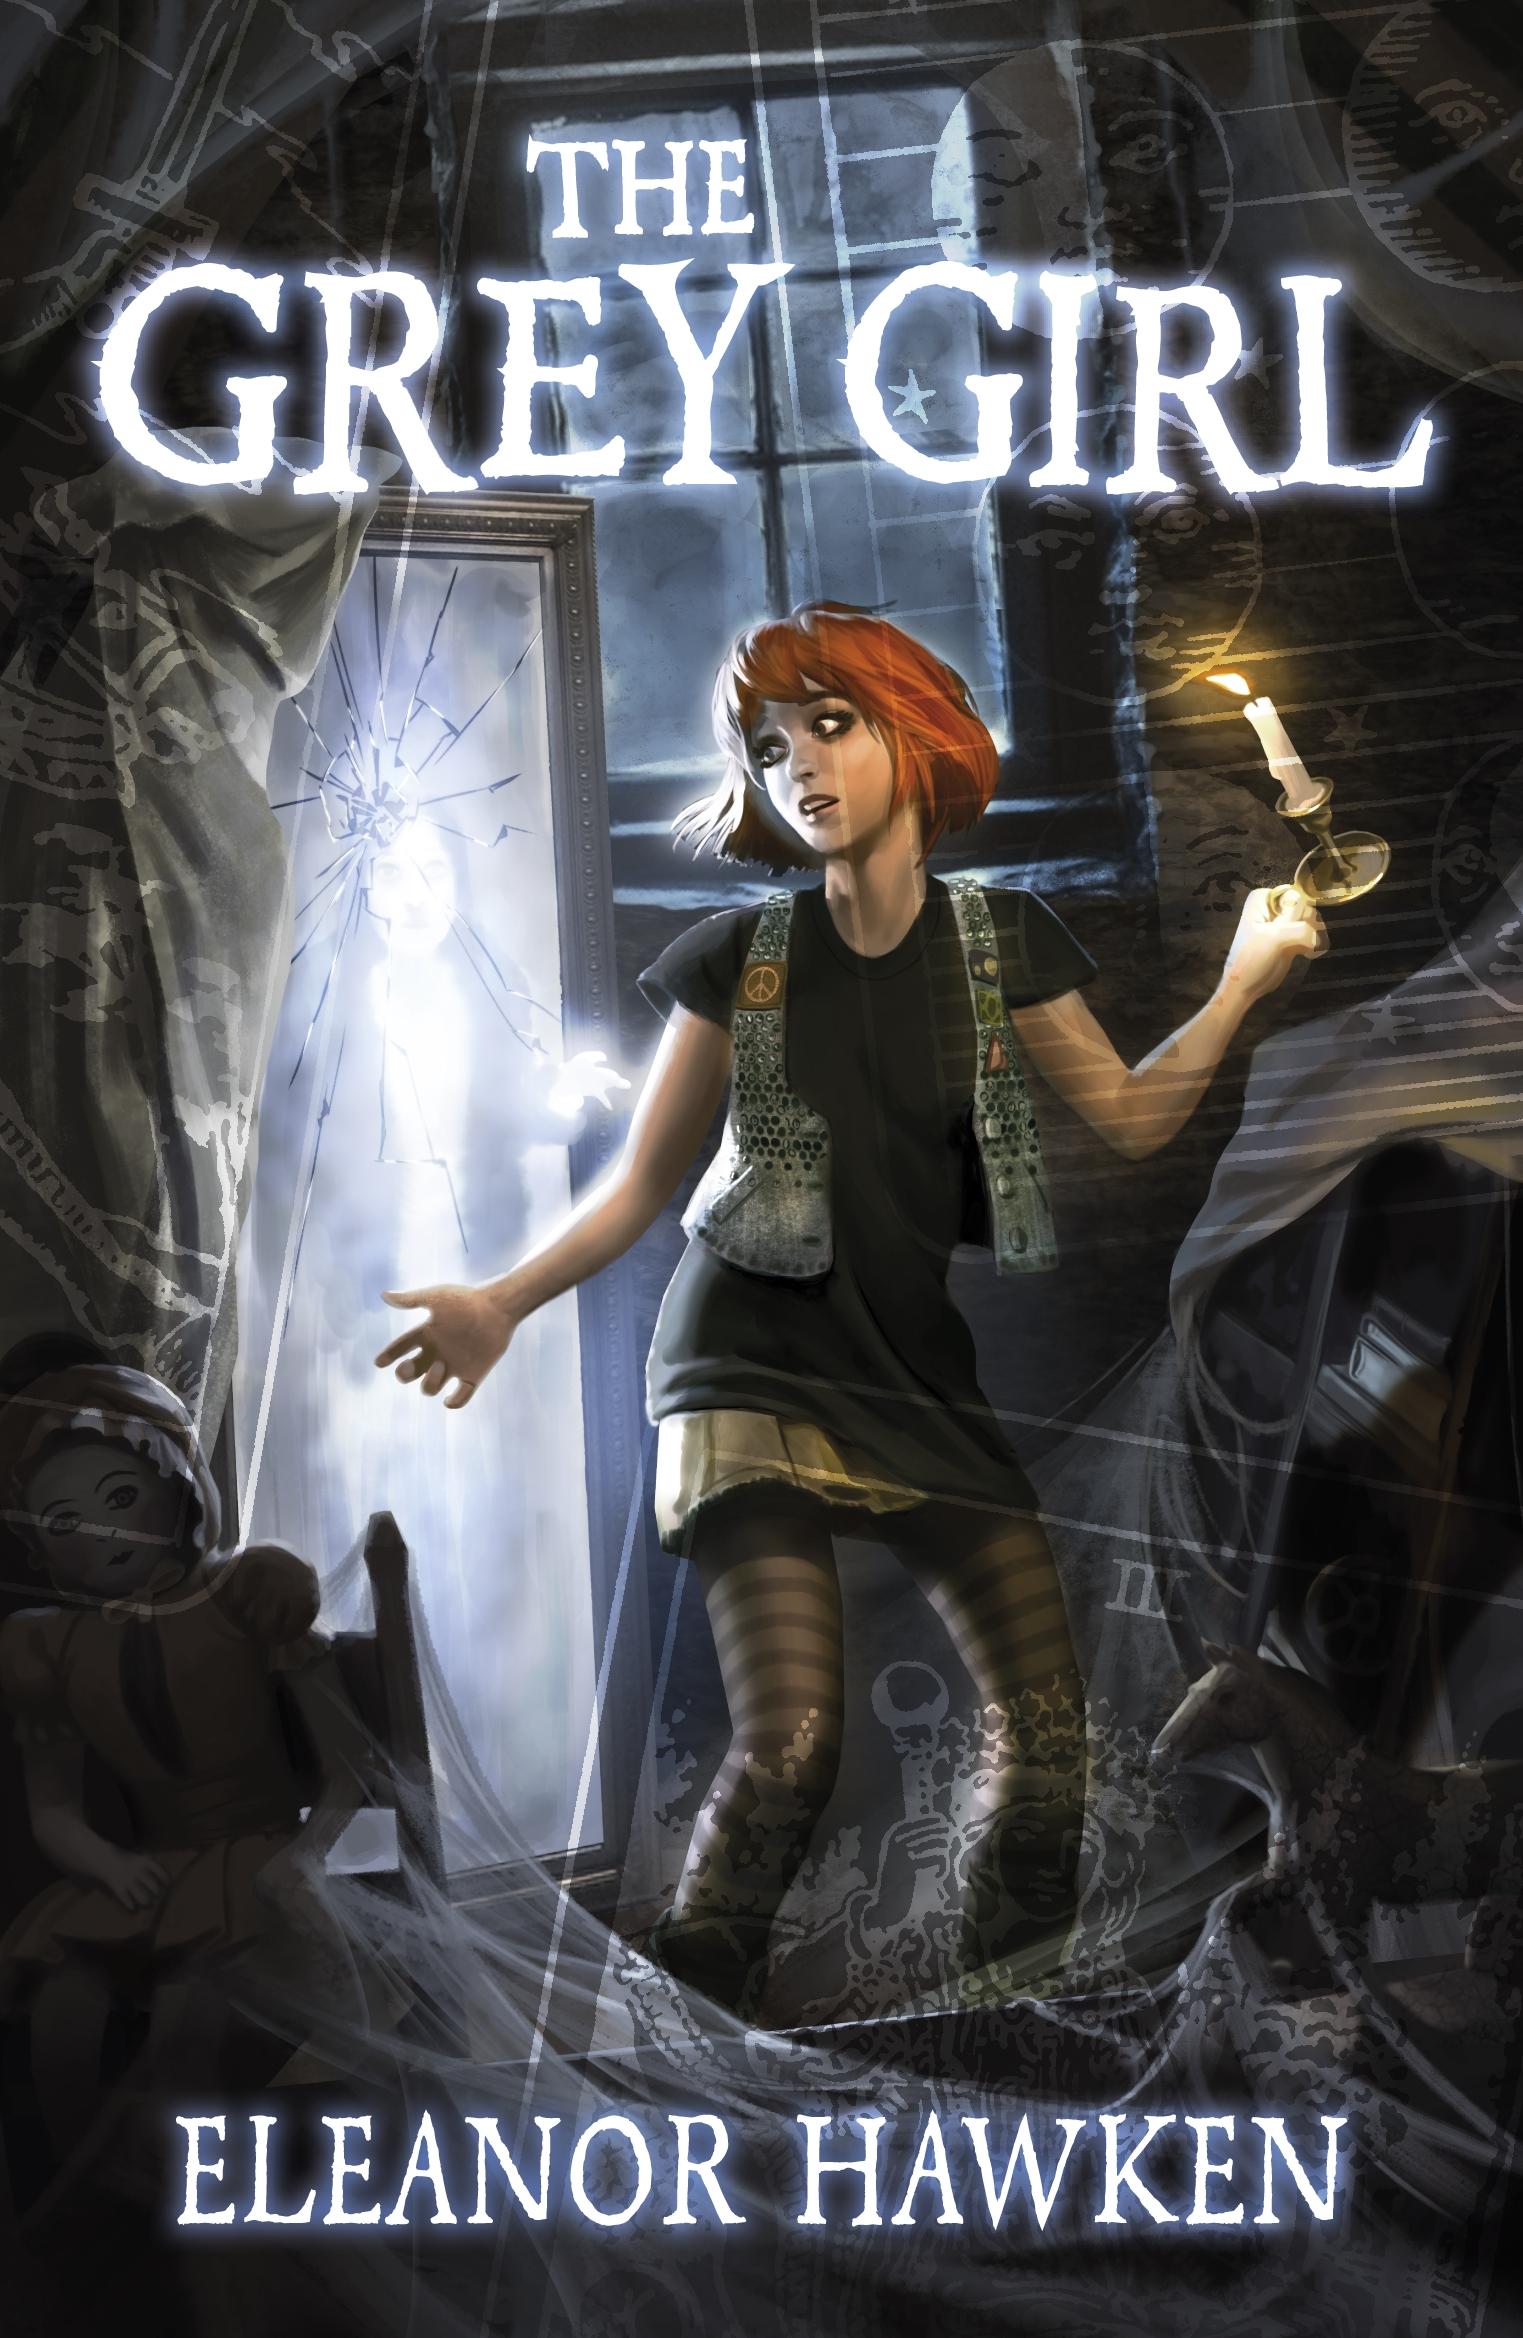 The Grey Girl by Eleanor Hawken